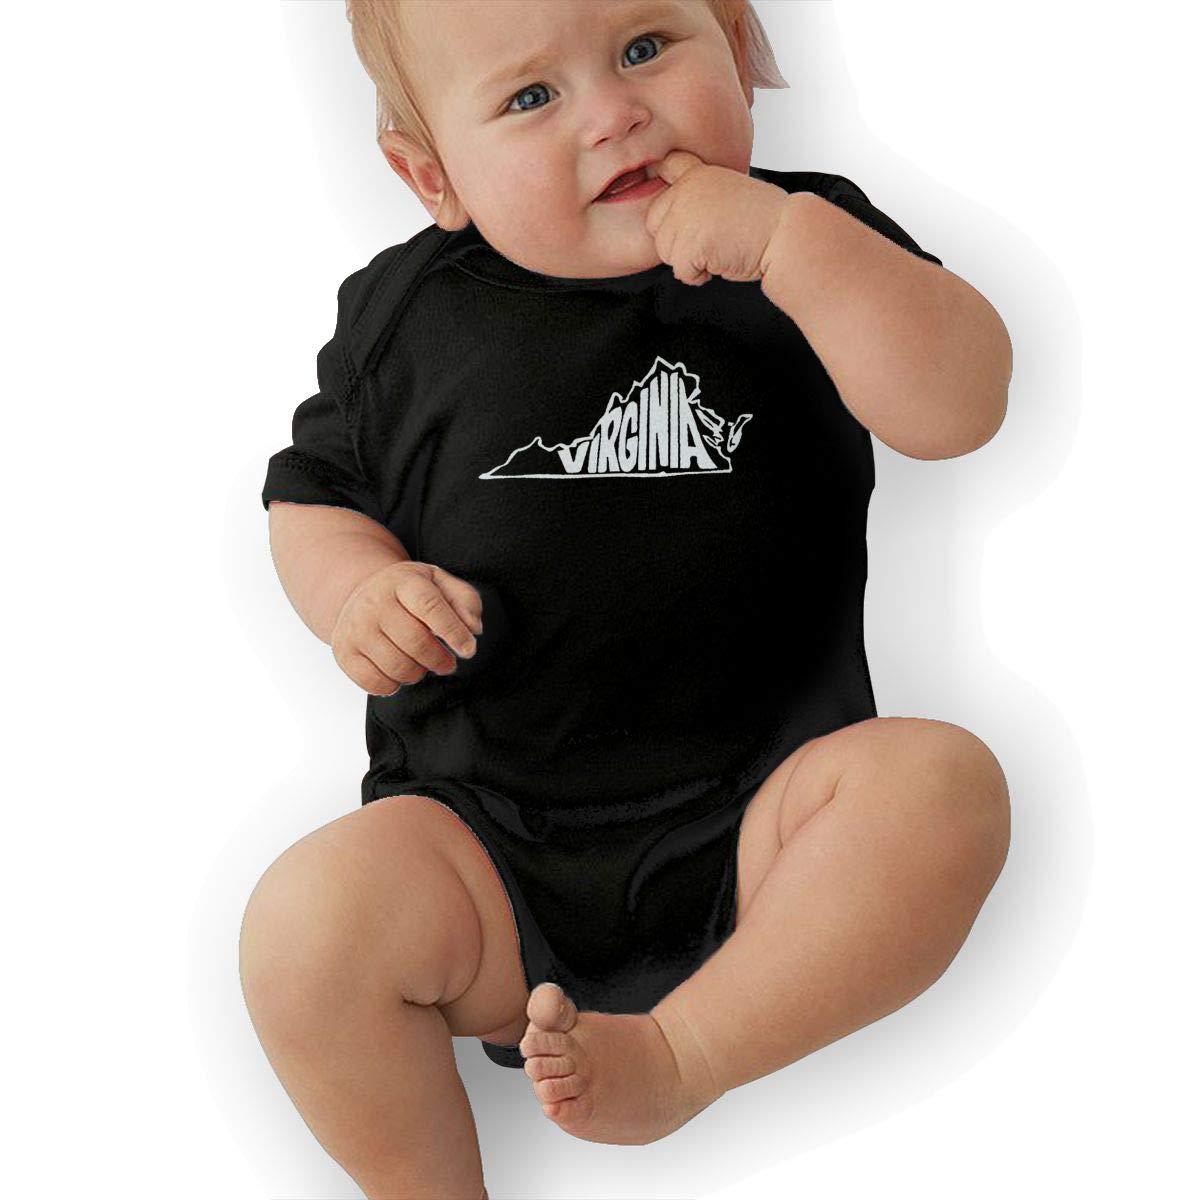 Manlee Virginia State Newborn Infant Toddler Baby Girls Boys Bodysuit Short Sleeve 0-24 MonthsBlack